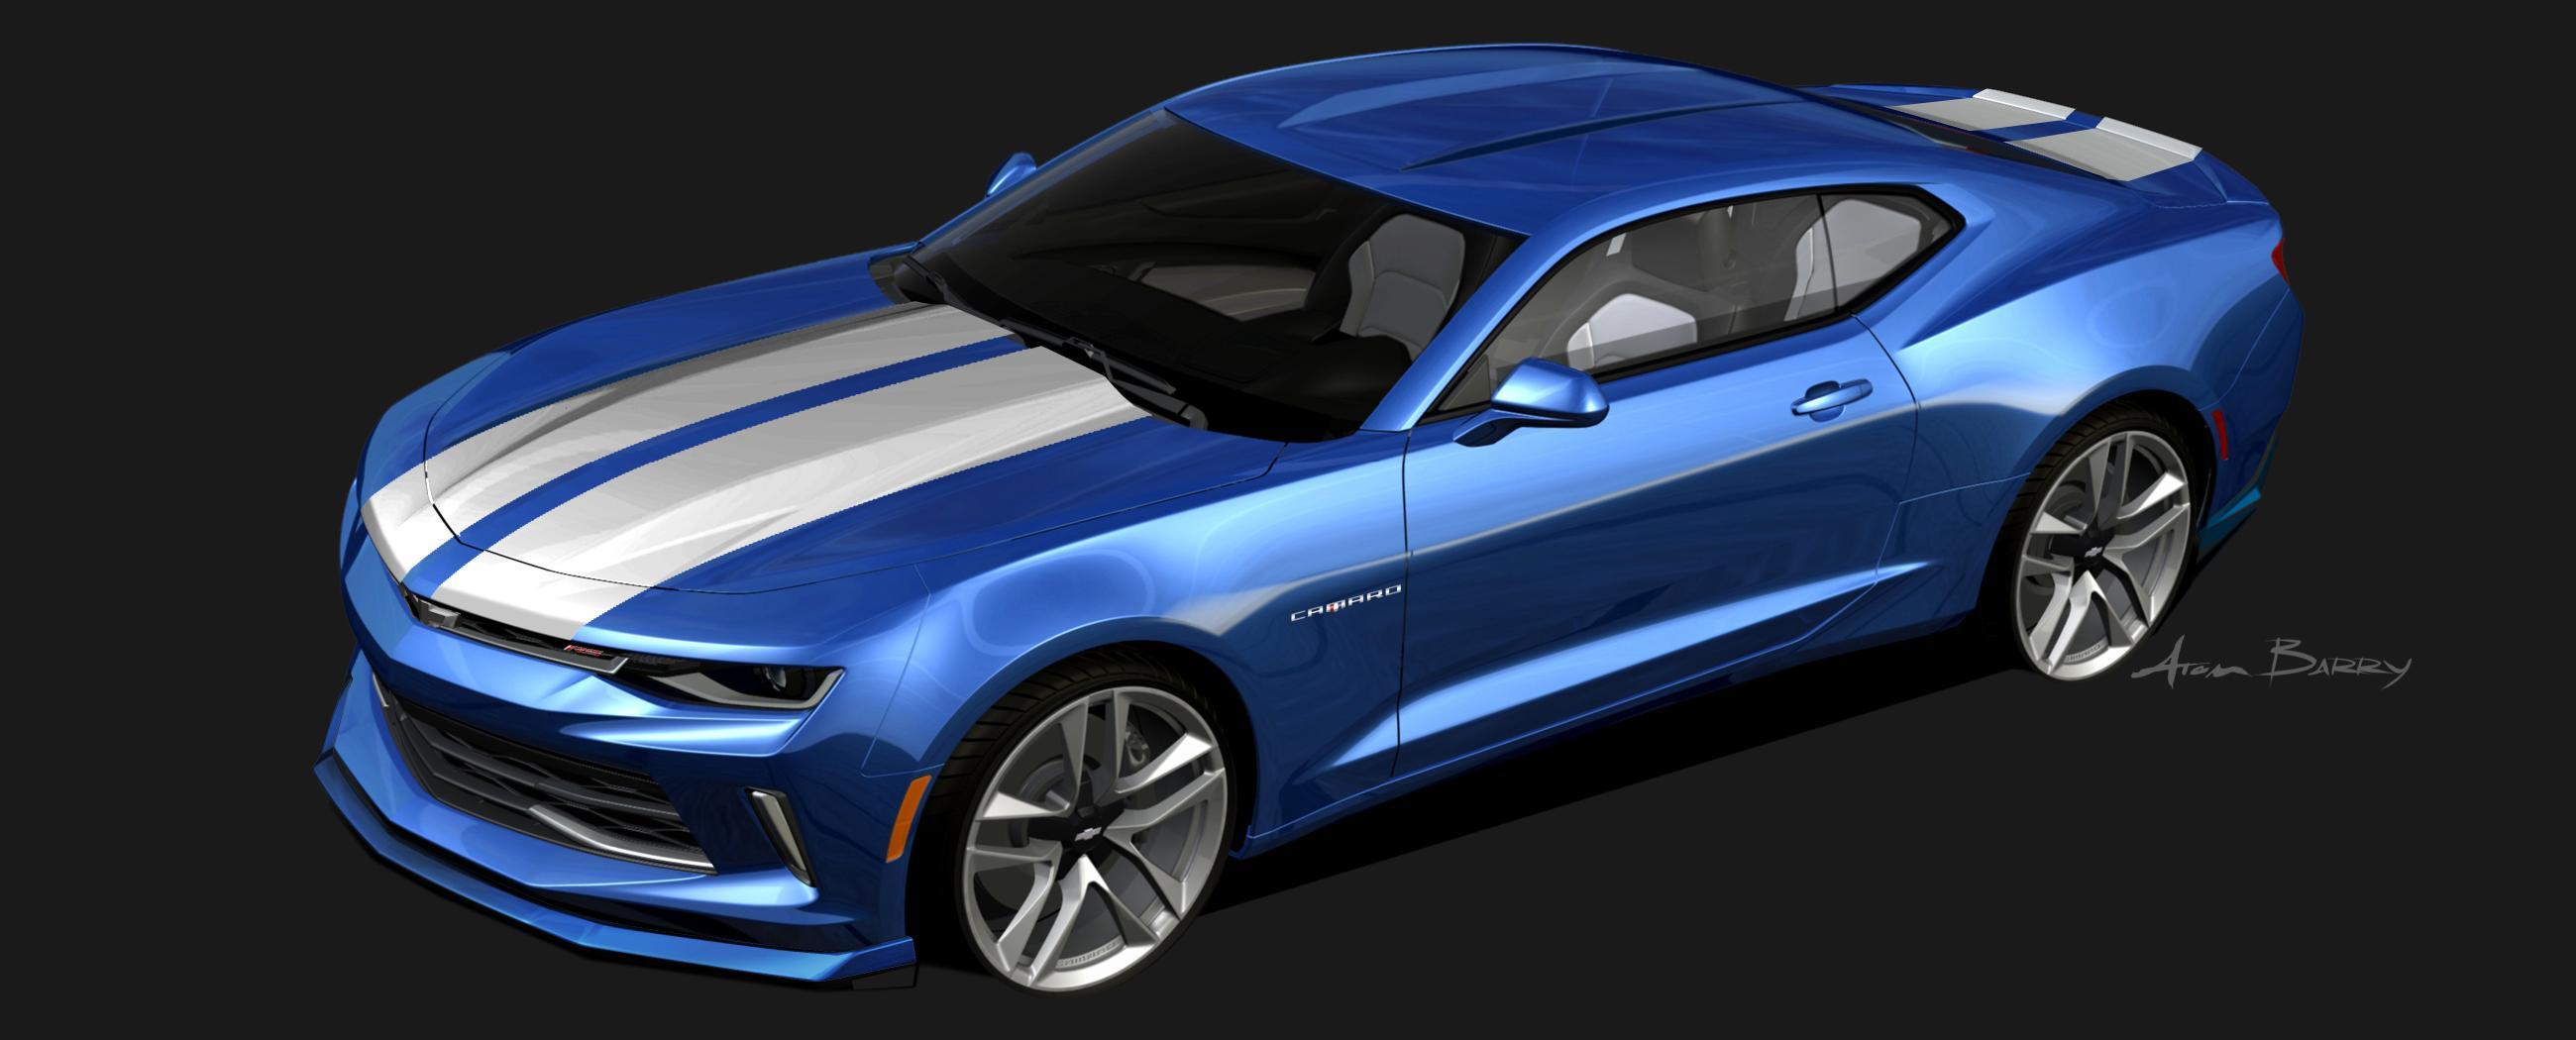 2016 Chevy Camaro Gets 4 Custom Concepts For 2015 Sema